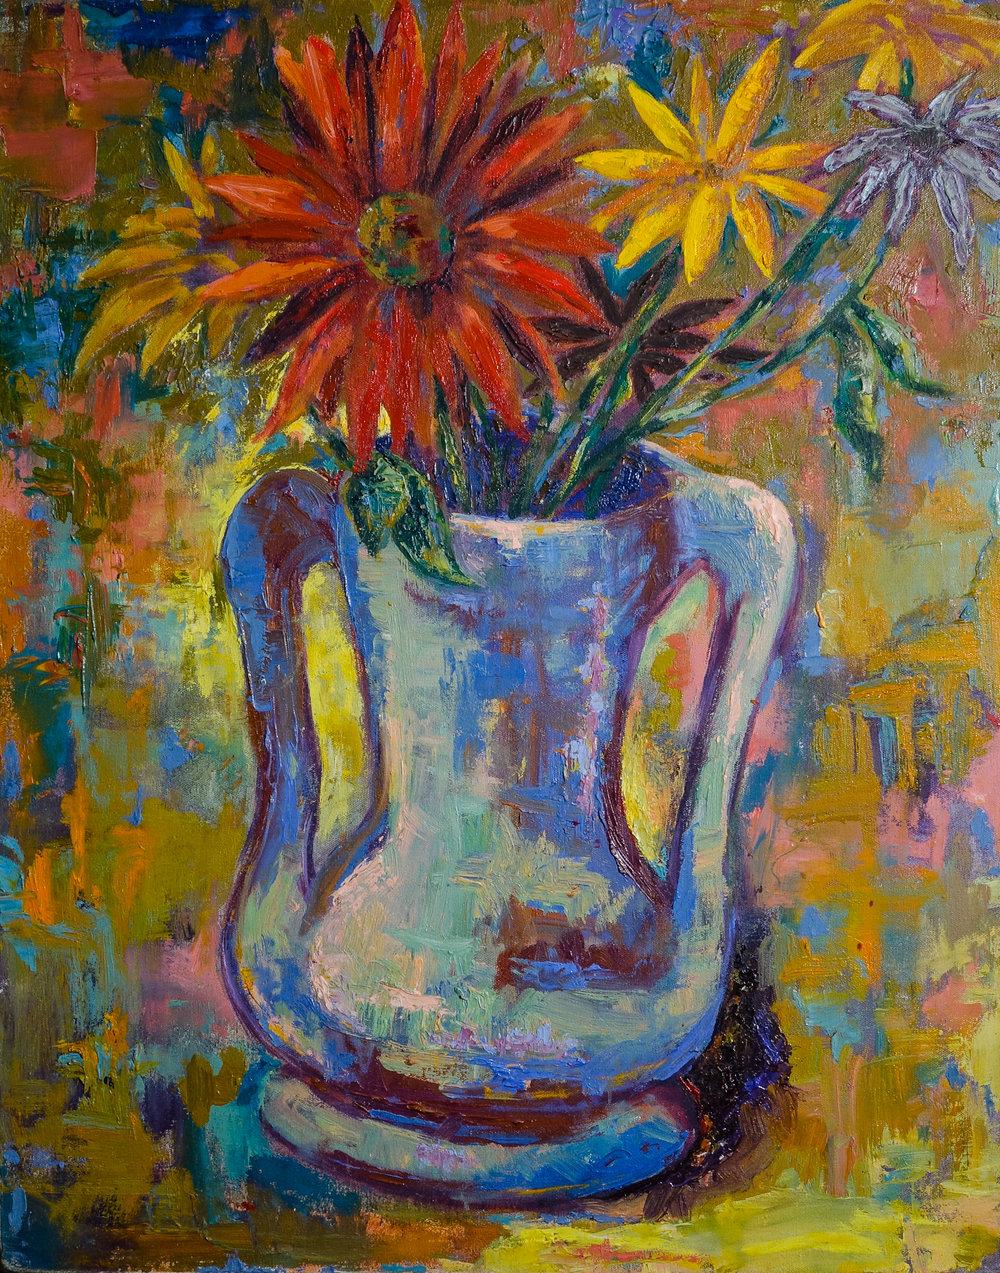 Still Life with 2 Handled Vase